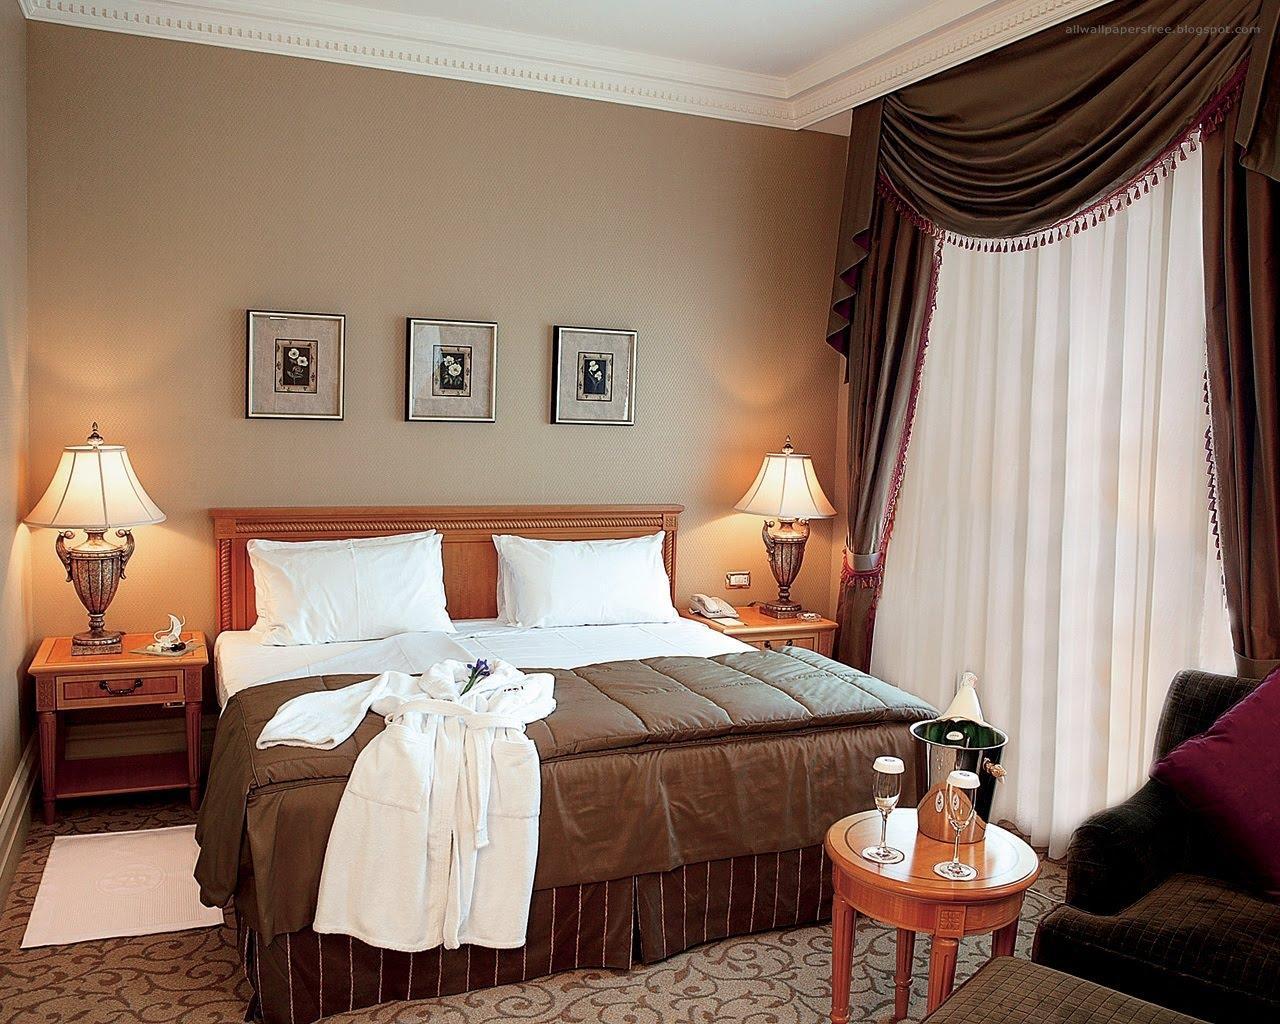 Best hotels interior design wallpapers